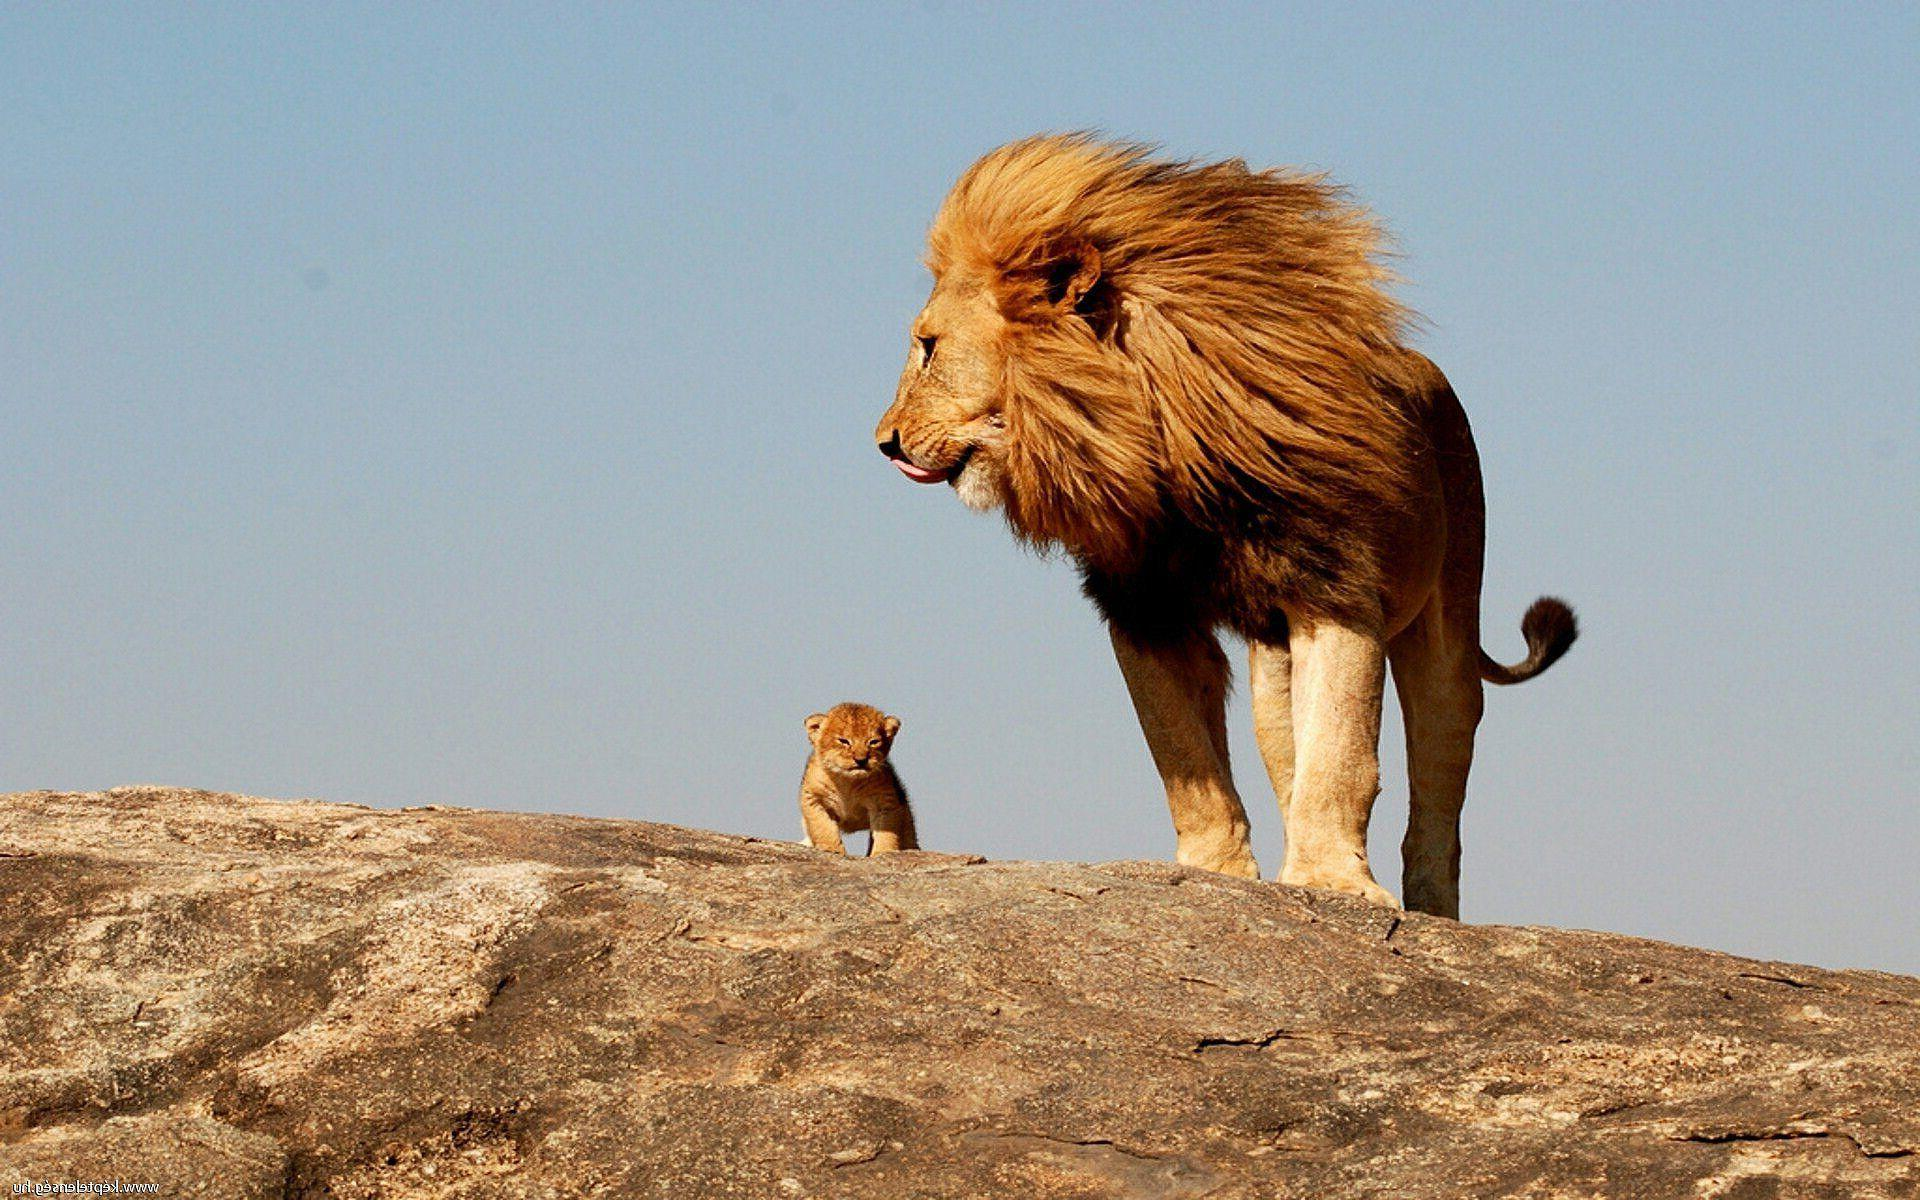 Wallpaper download lion - Cute Lion Cub Wallpaper Wallpaper Download